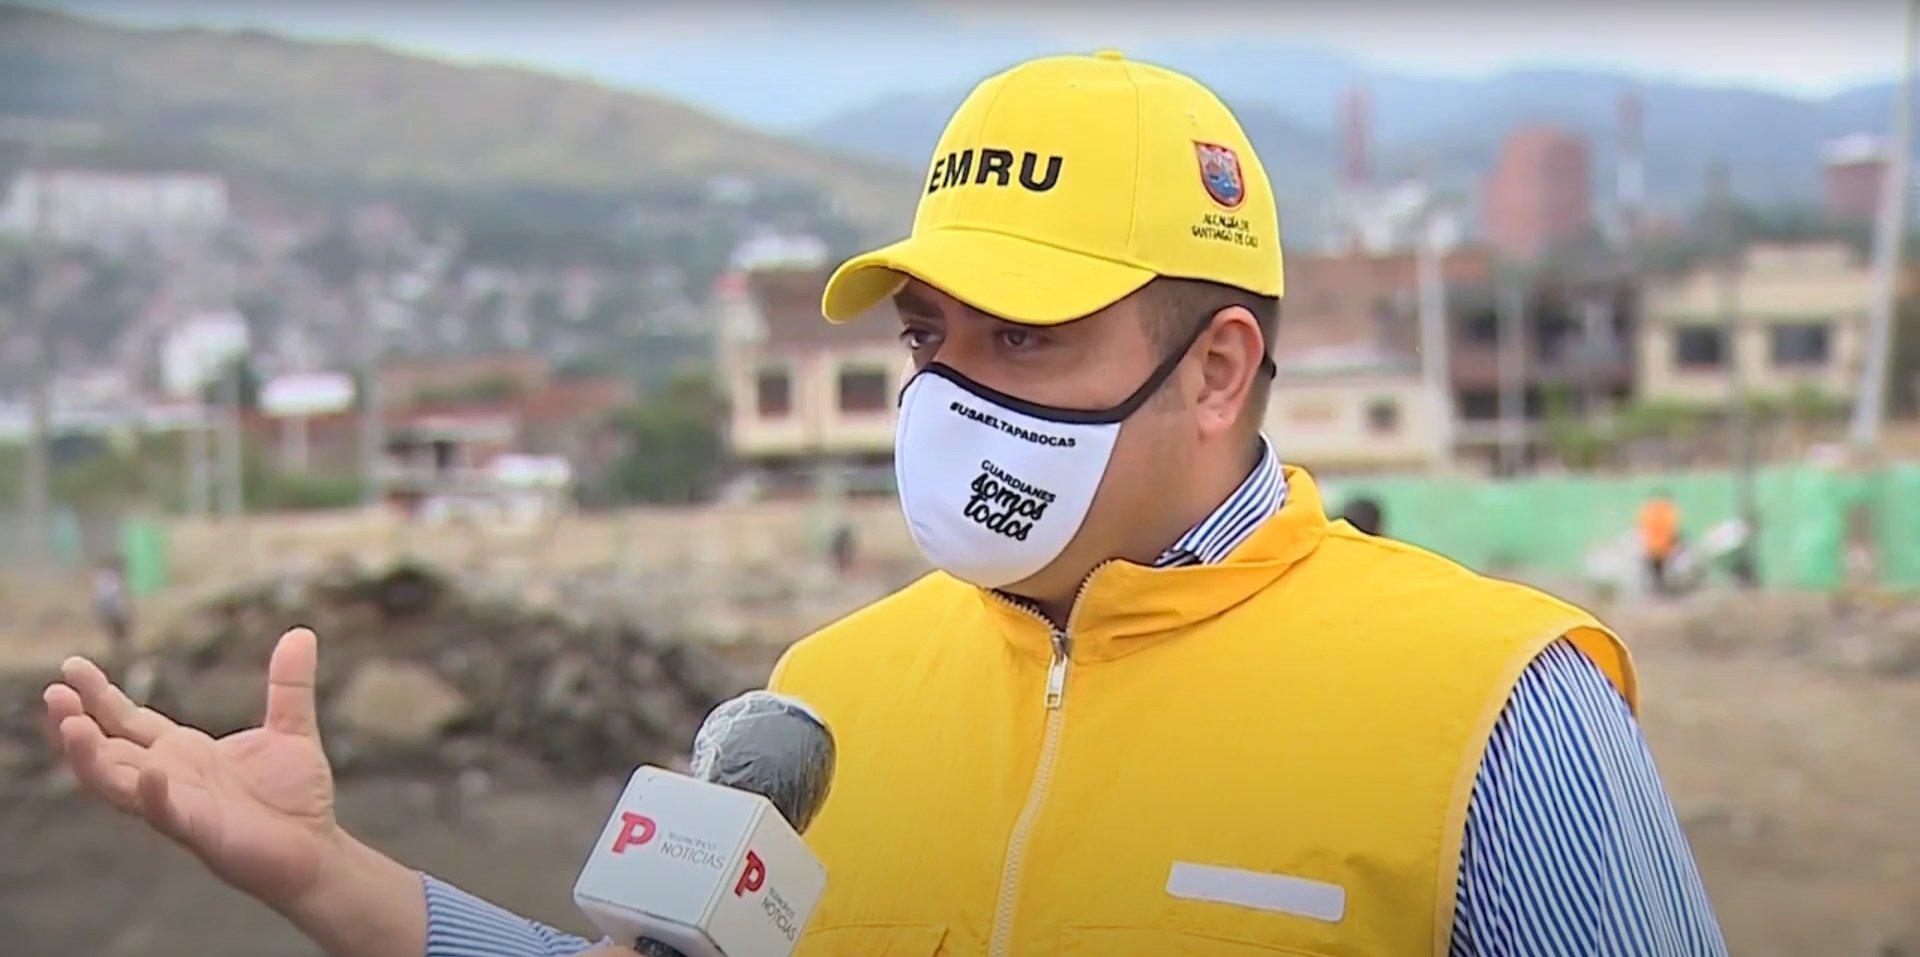 Yecid Cruz Ramírez - EMRU